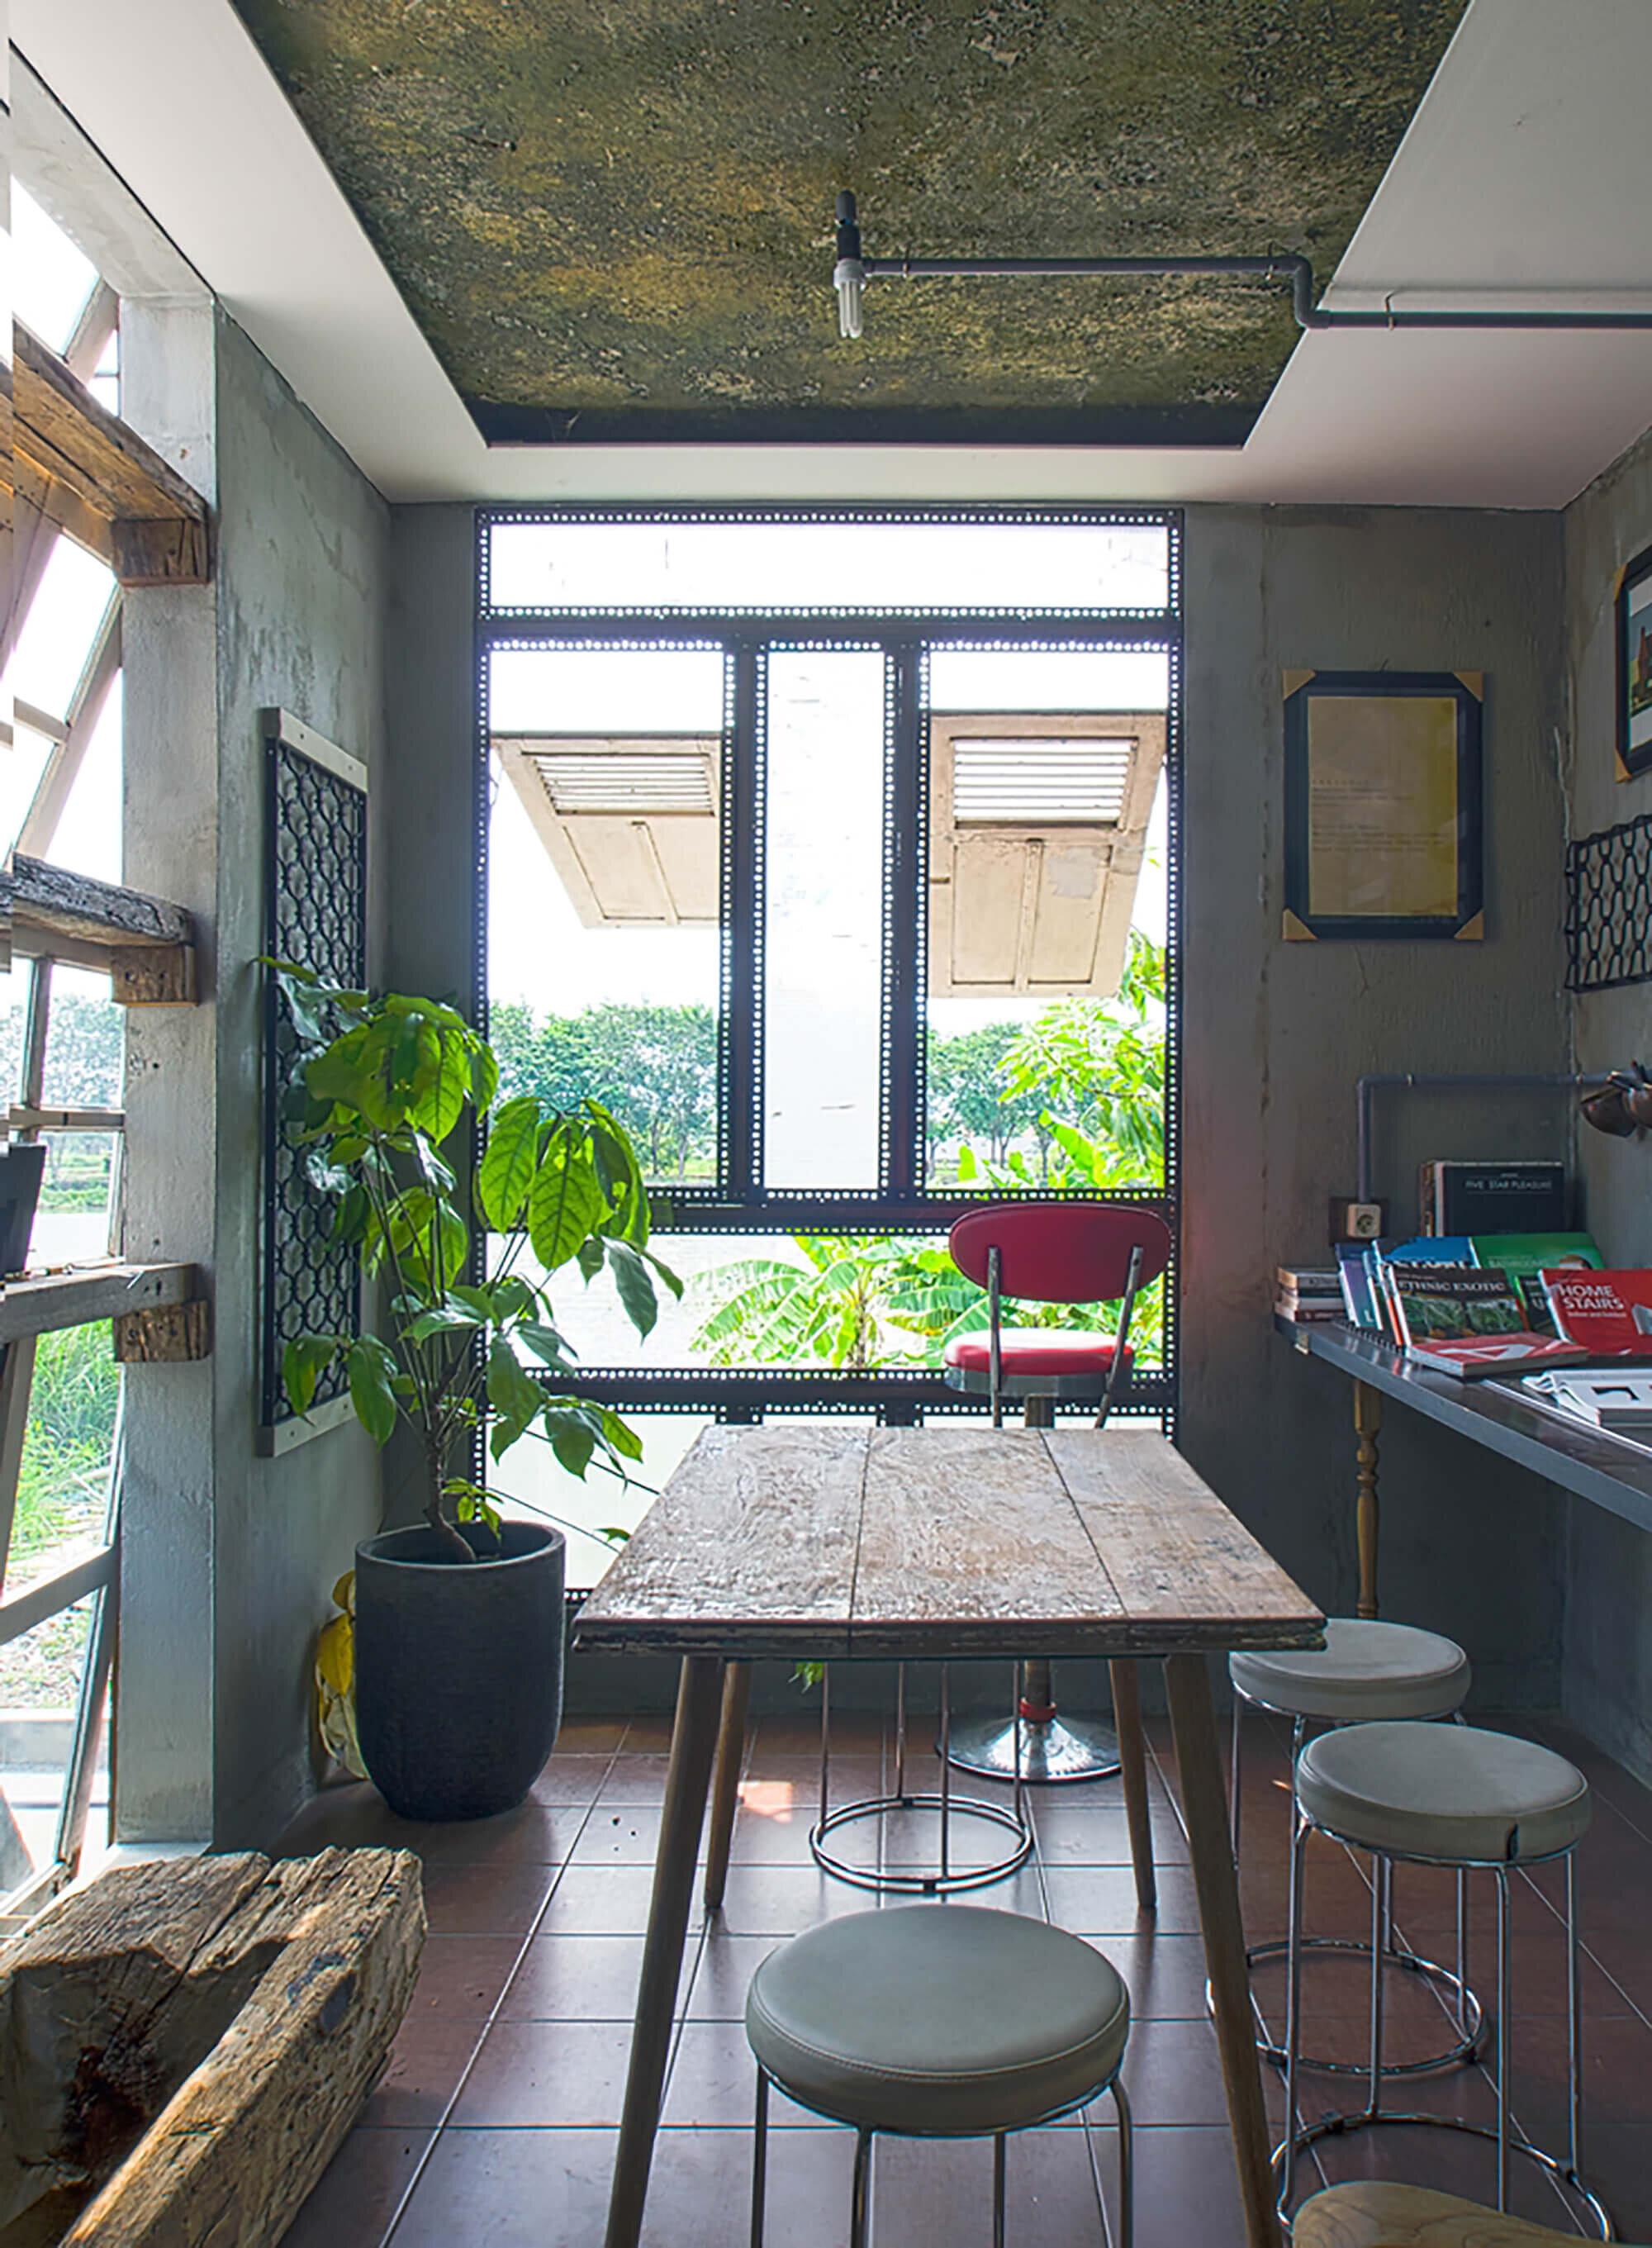 The-Obsolete-House-Omah-Amoh-Gayuh-Budi-Utomo-Indonesia-3